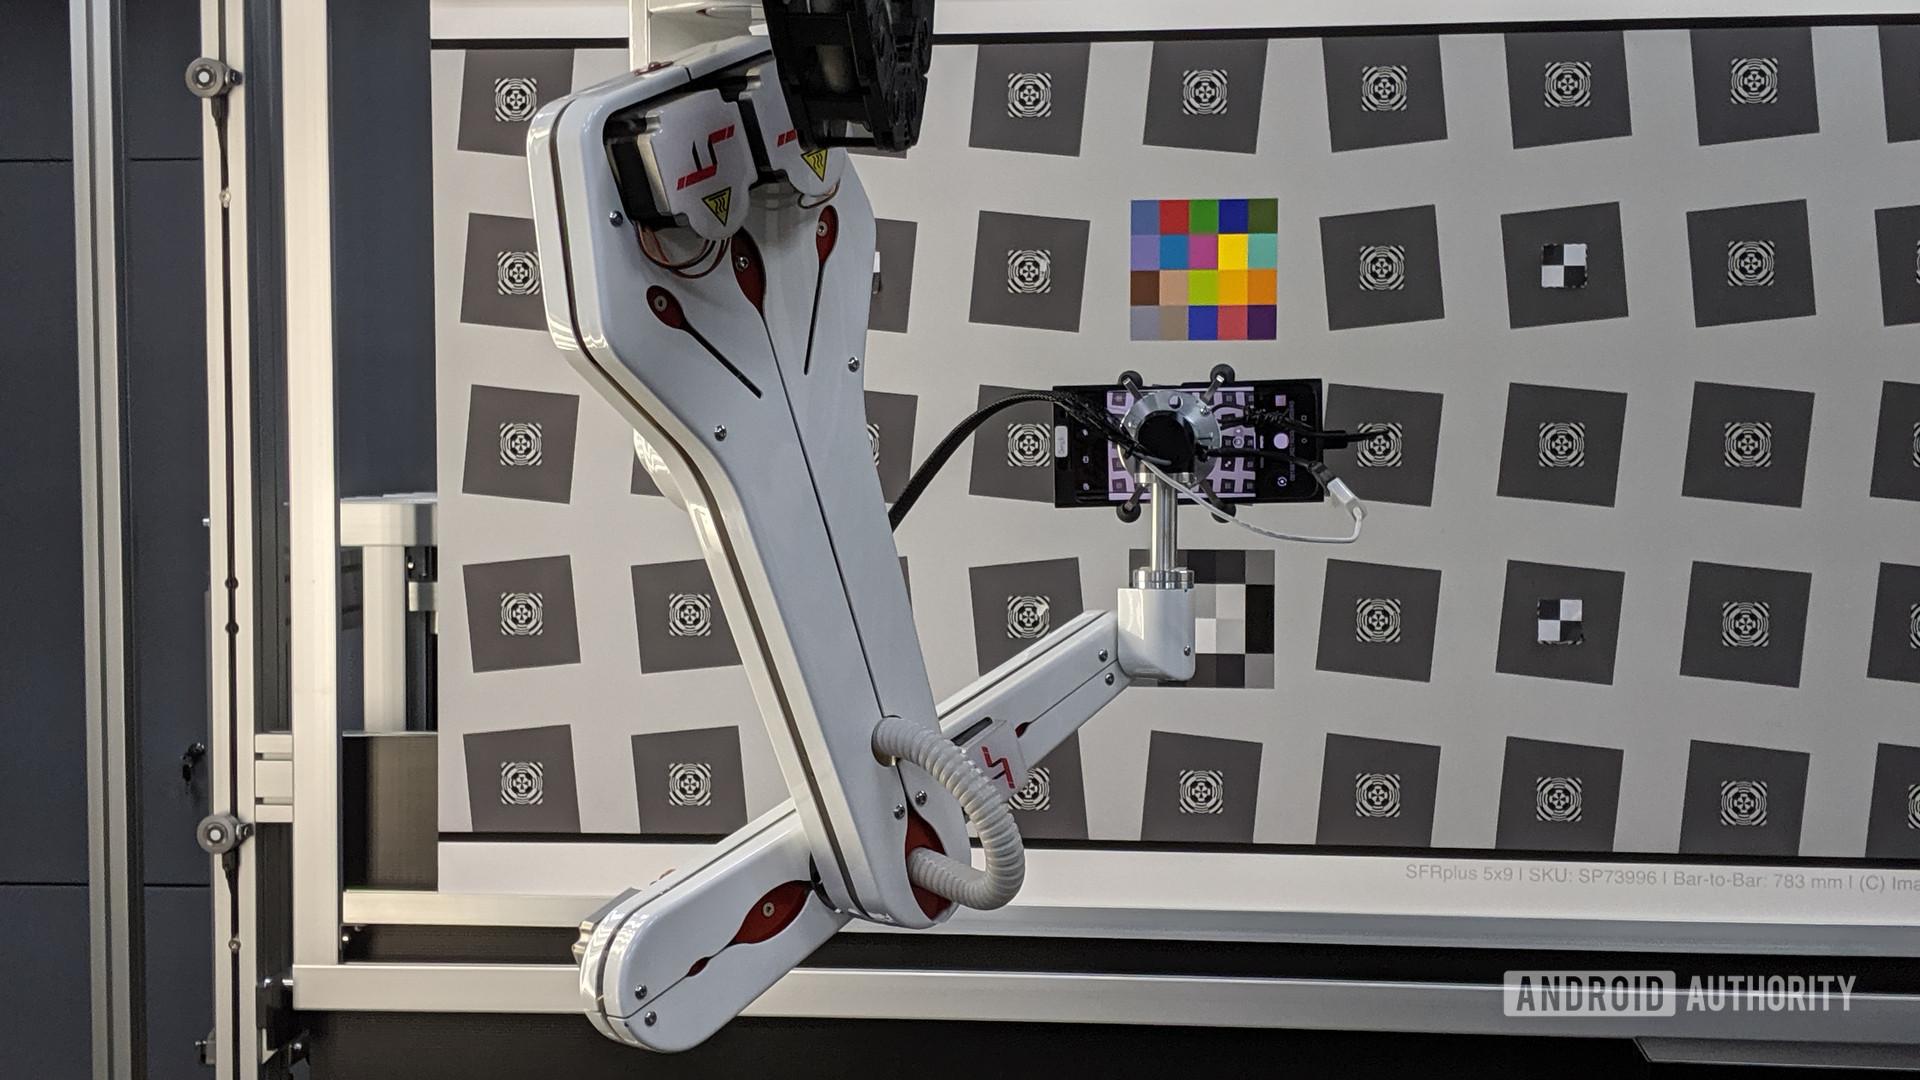 OnePlus Camera Lab - robot arm used to simulate multiple scenarios